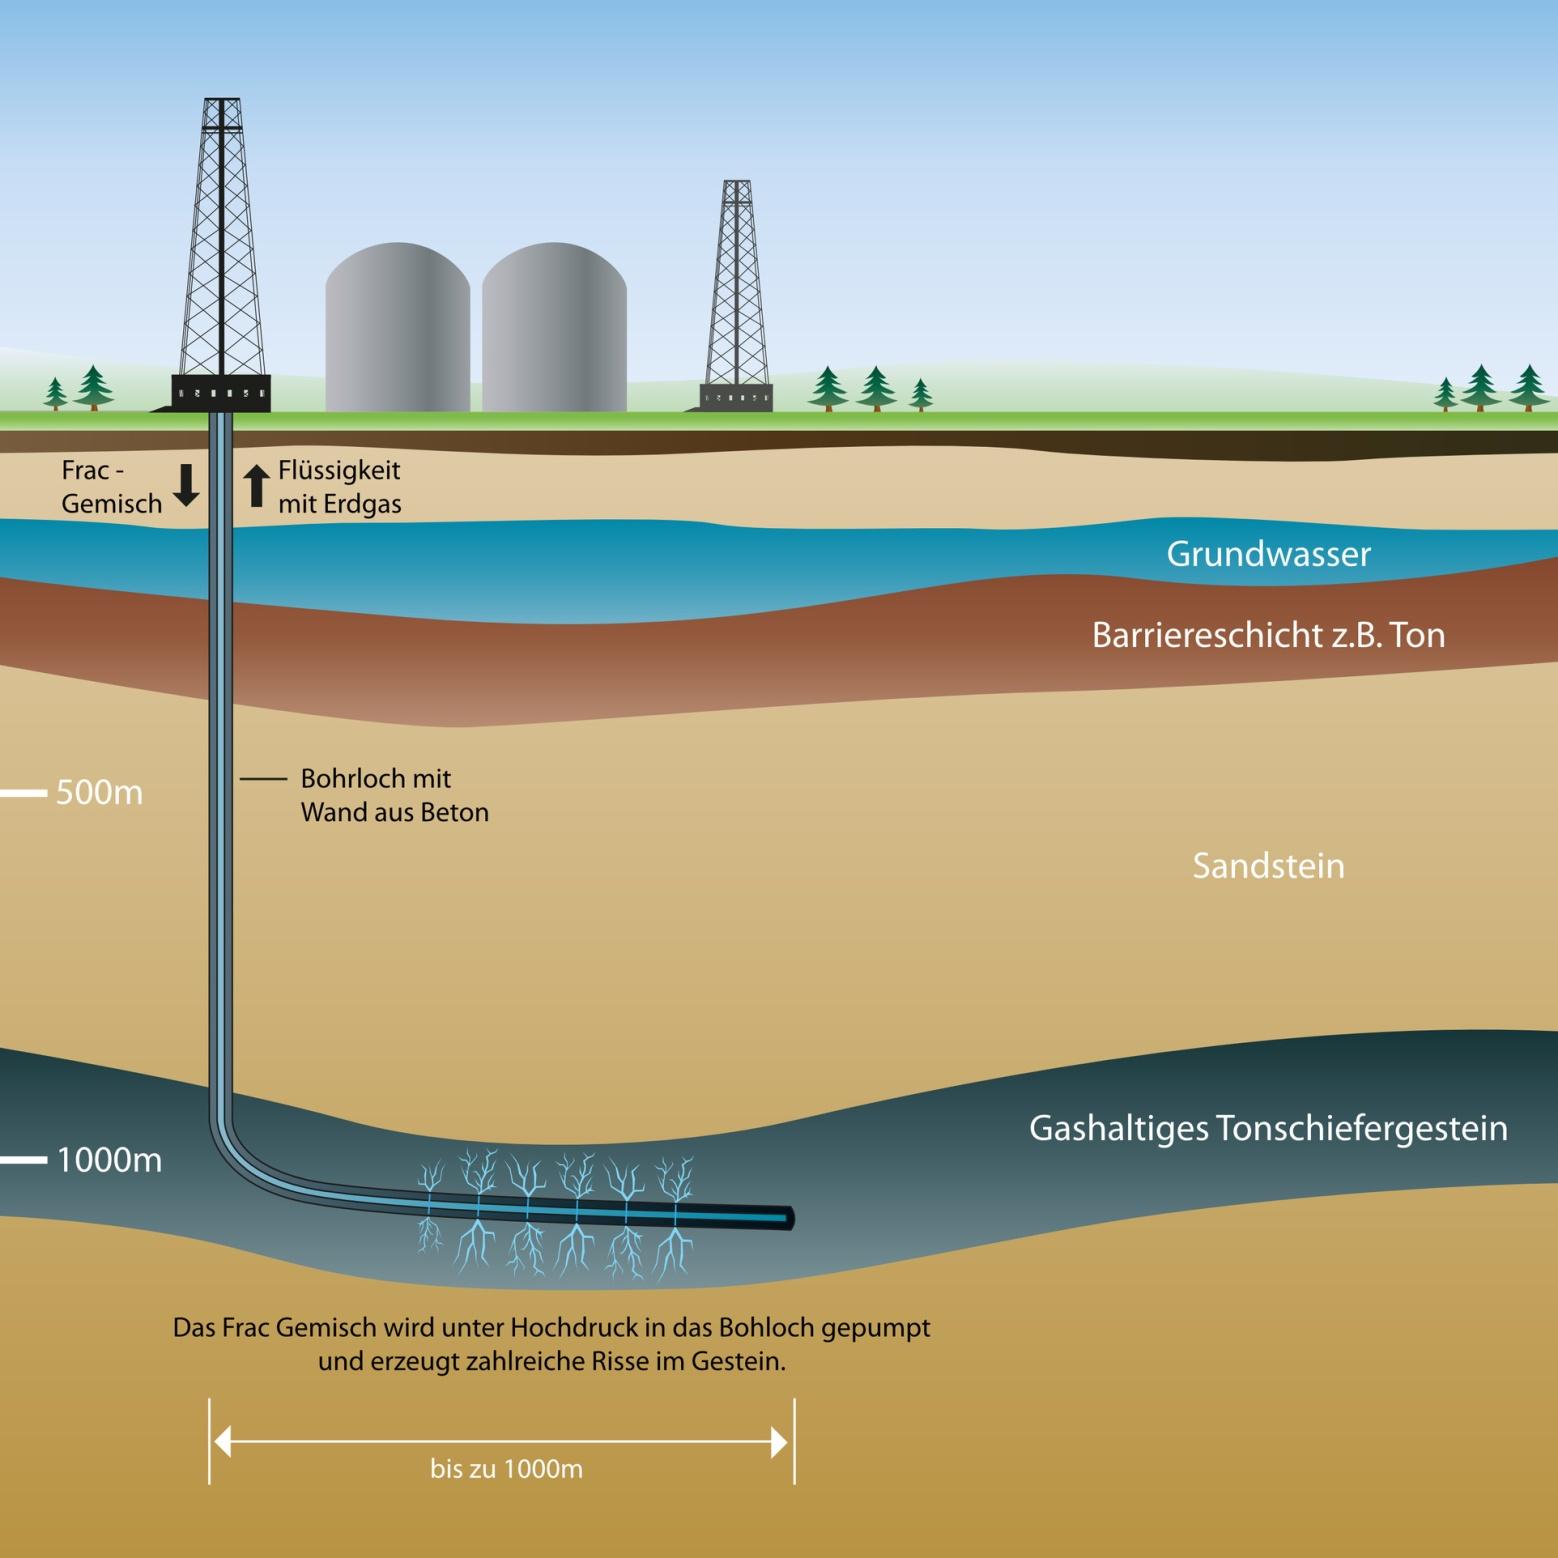 Fracking Quelle: bilderzwerg / Fotolia.com